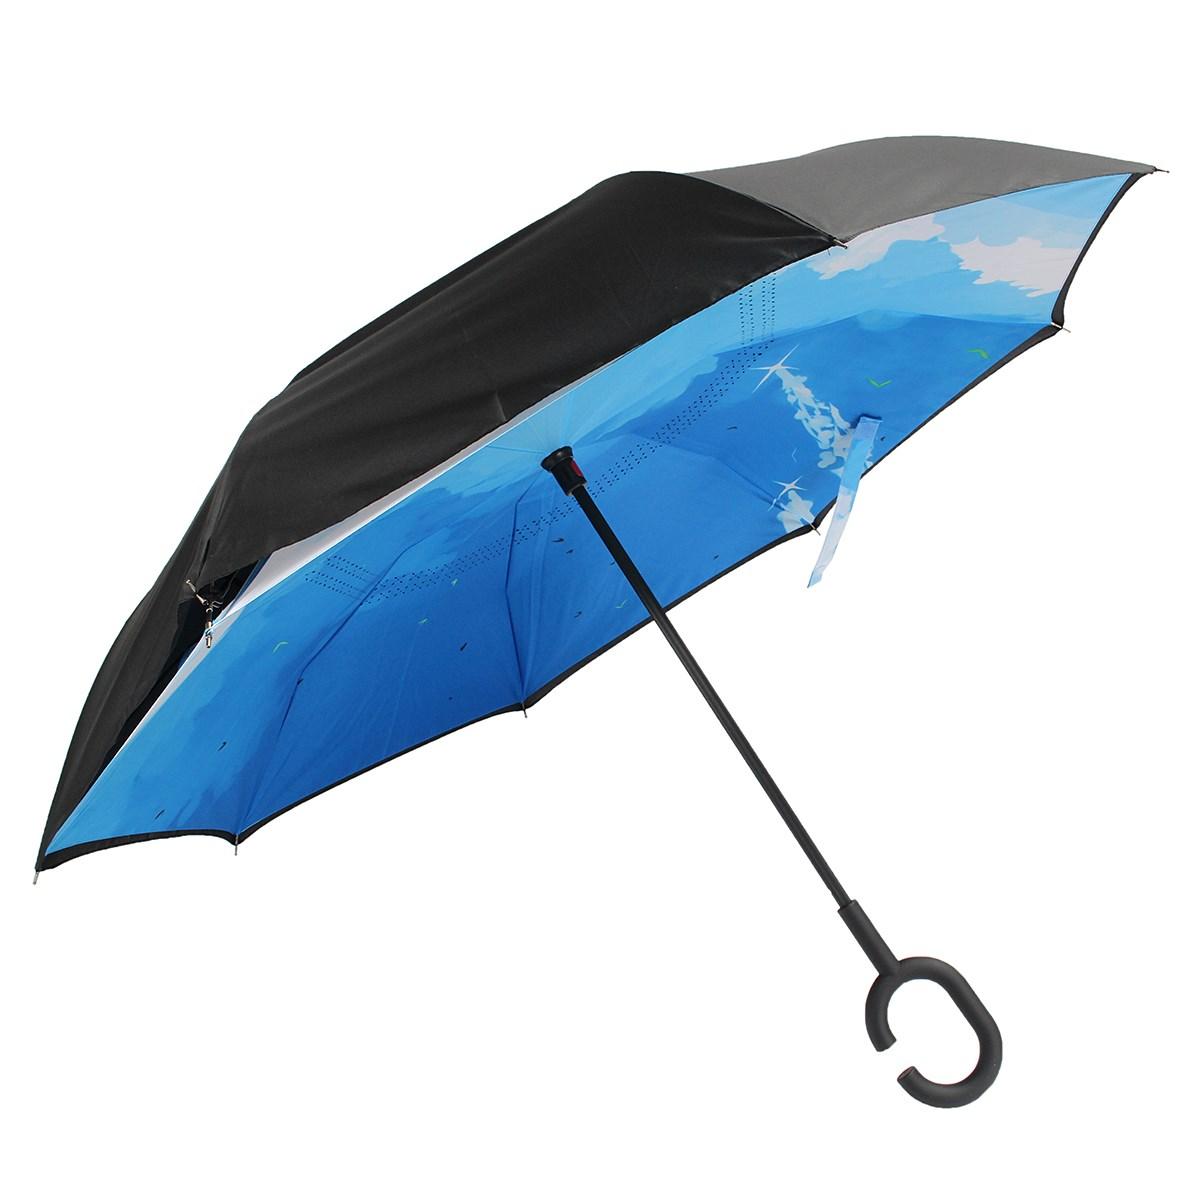 Blue C-Handle Windproof Reverse Umbrella Double Layer Sun Rain UV Proof Umbrella Upside Down Inverted Bumbershoot Rain Gear(China (Mainland))